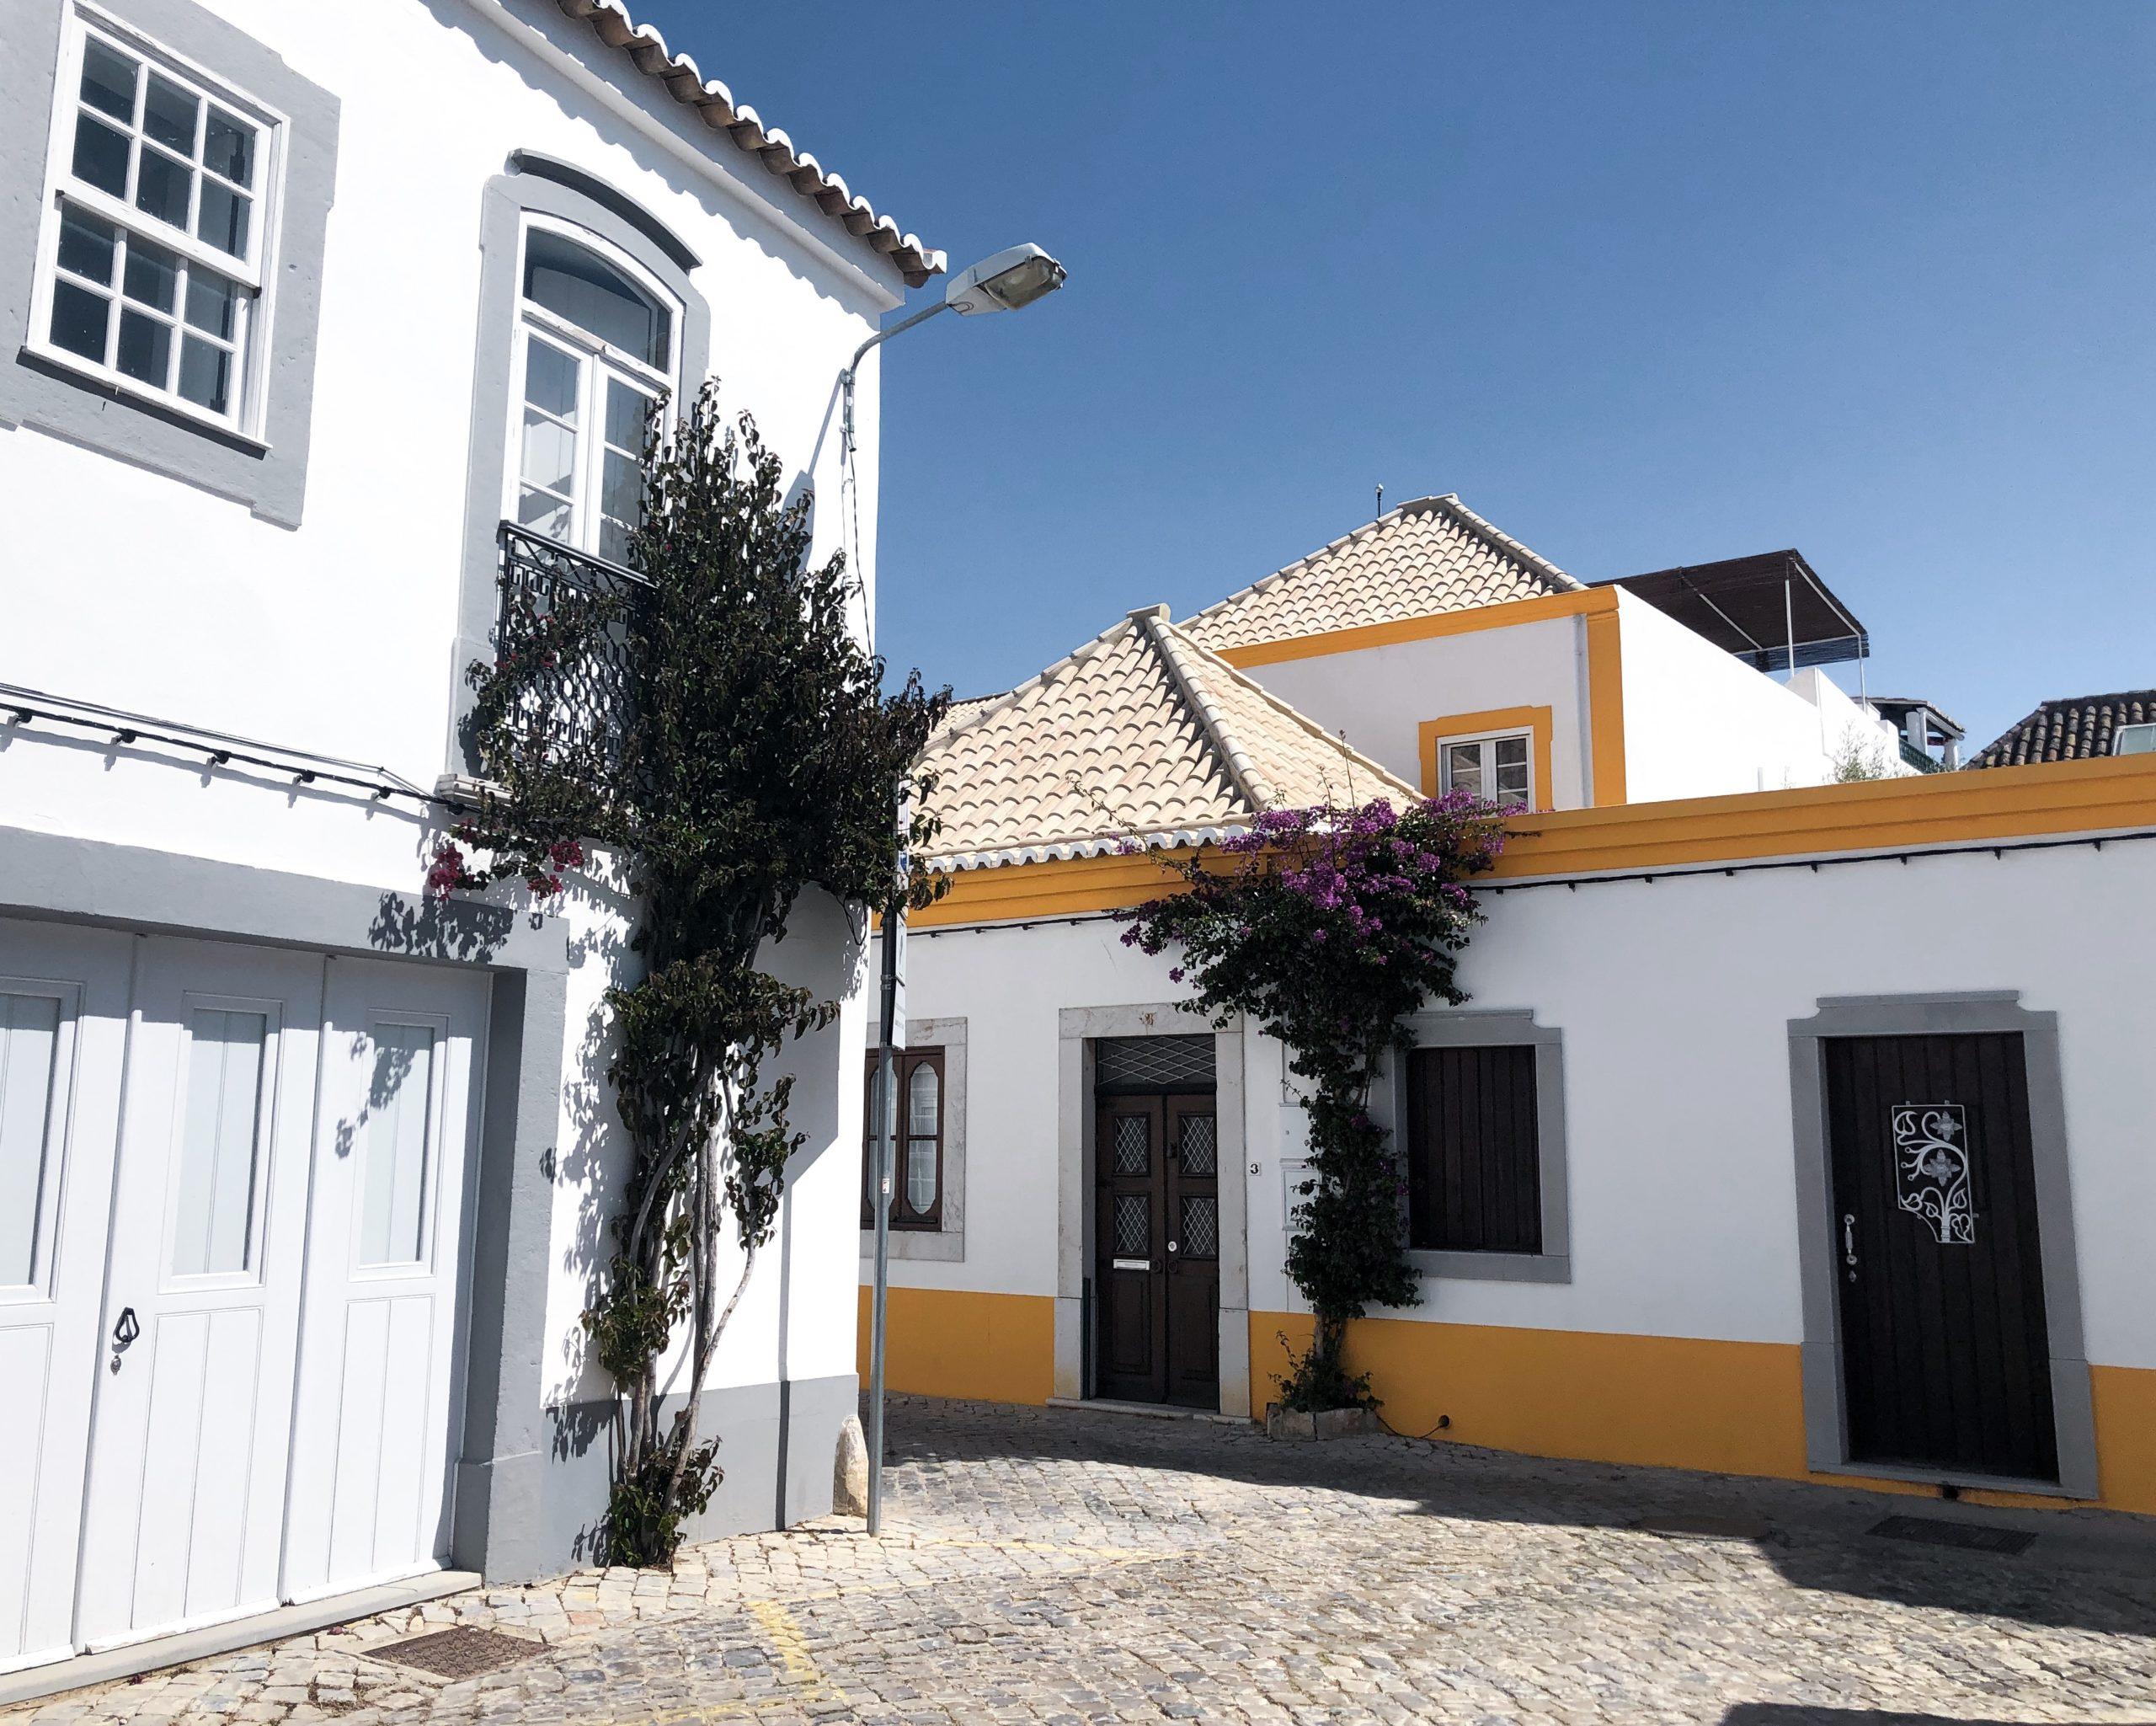 Portugal #03 Tavira, l'authentique